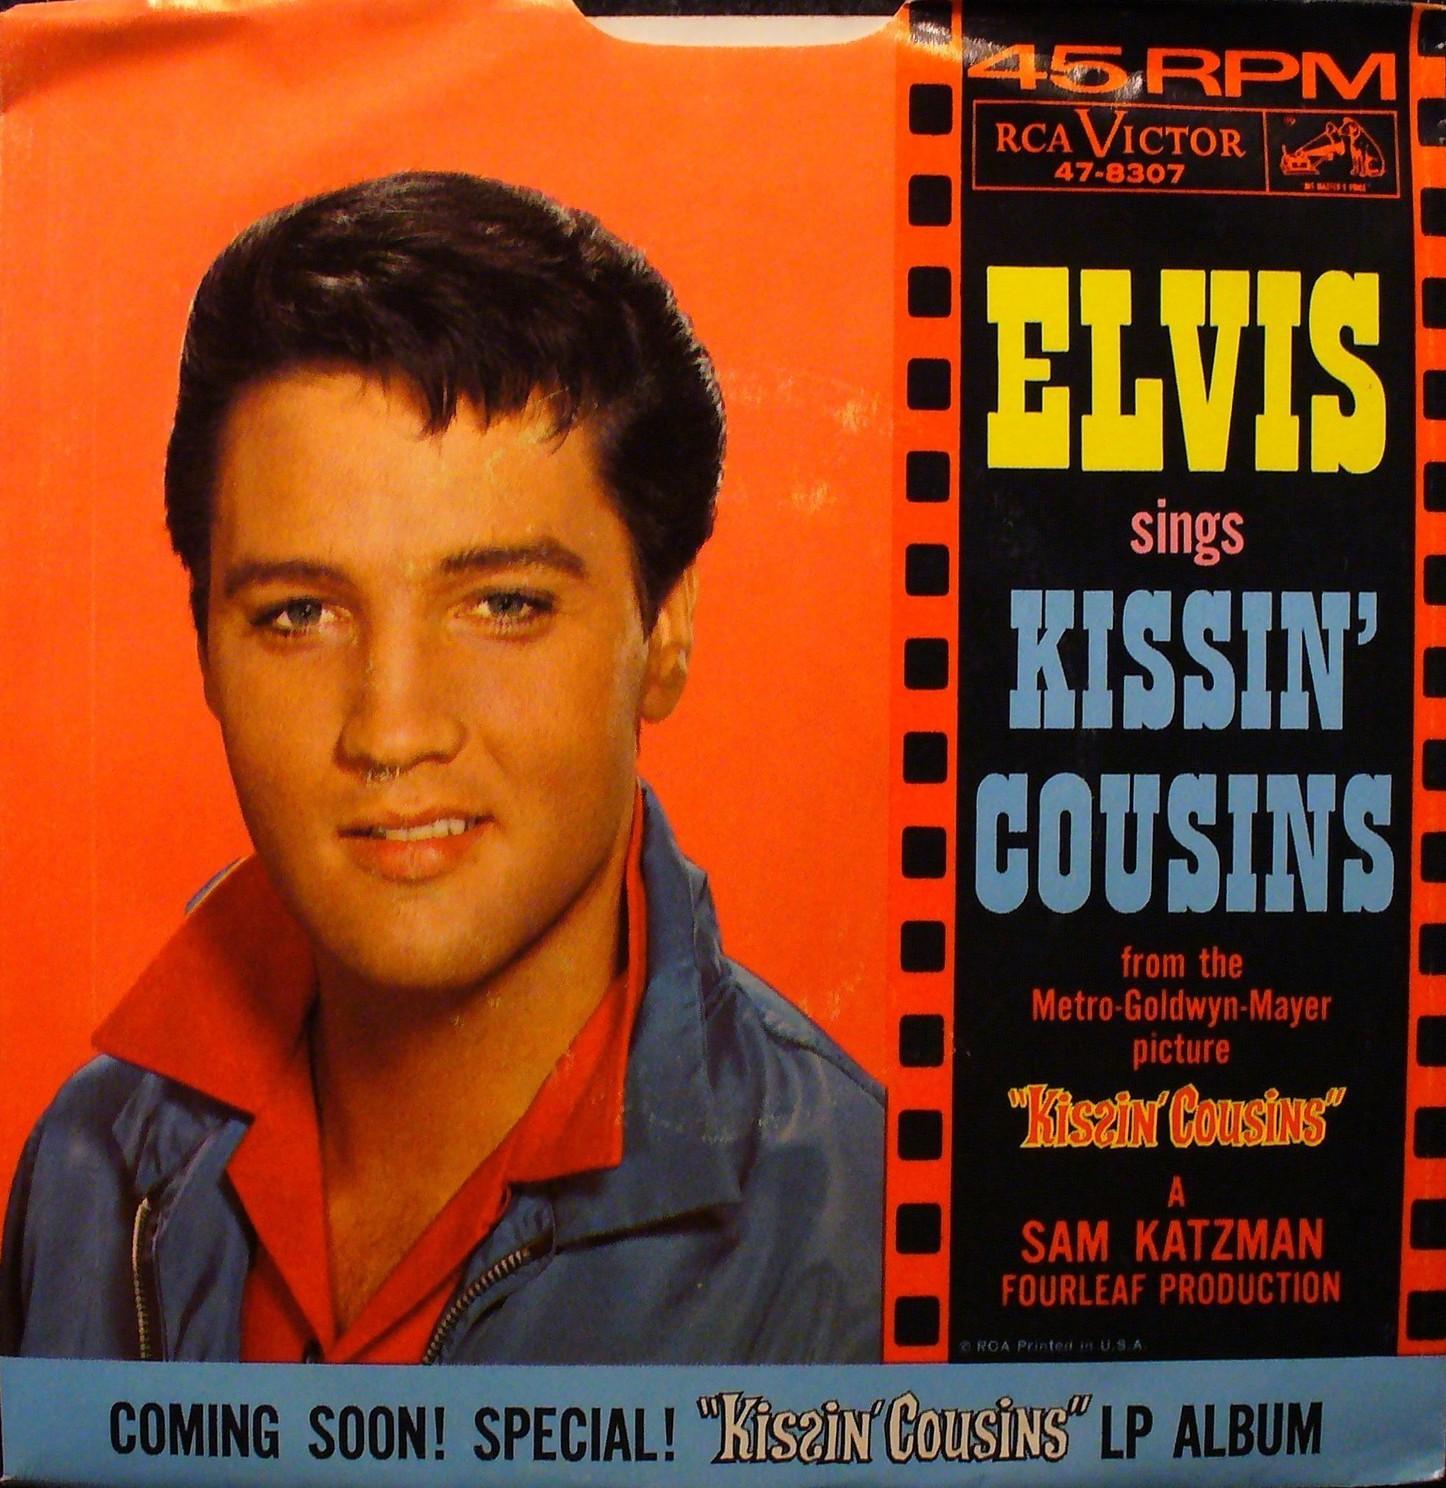 Kissin' Cousins / It Hurts Me 47-8307adxc49